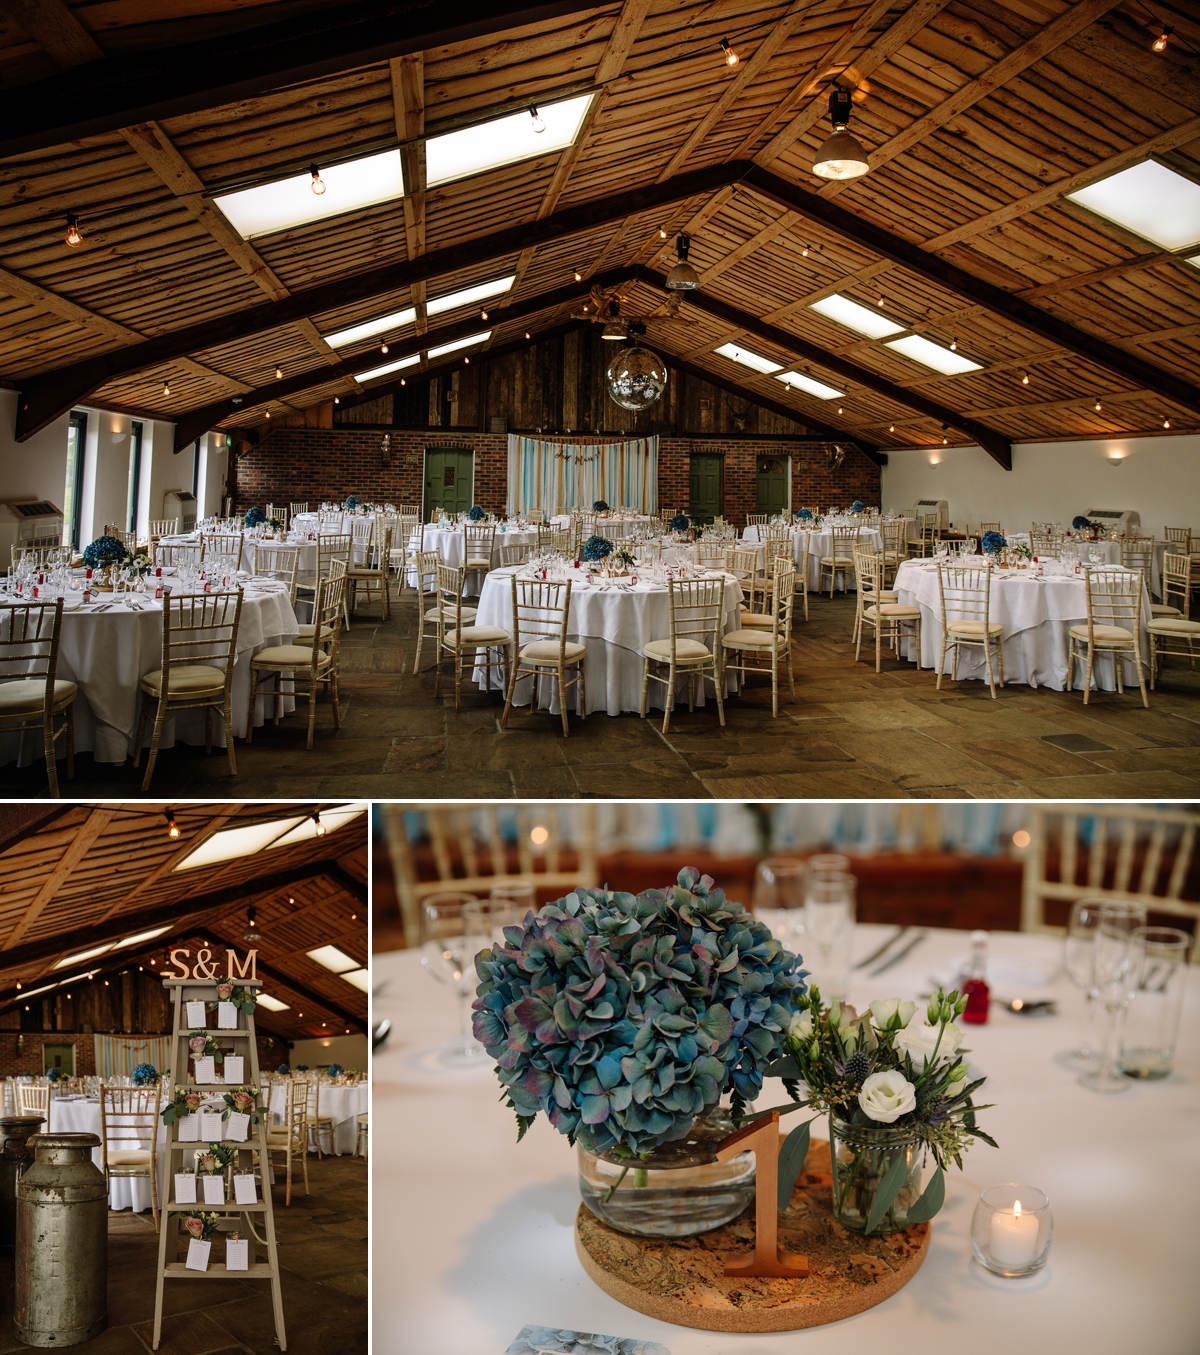 Wedding breakfast room and details